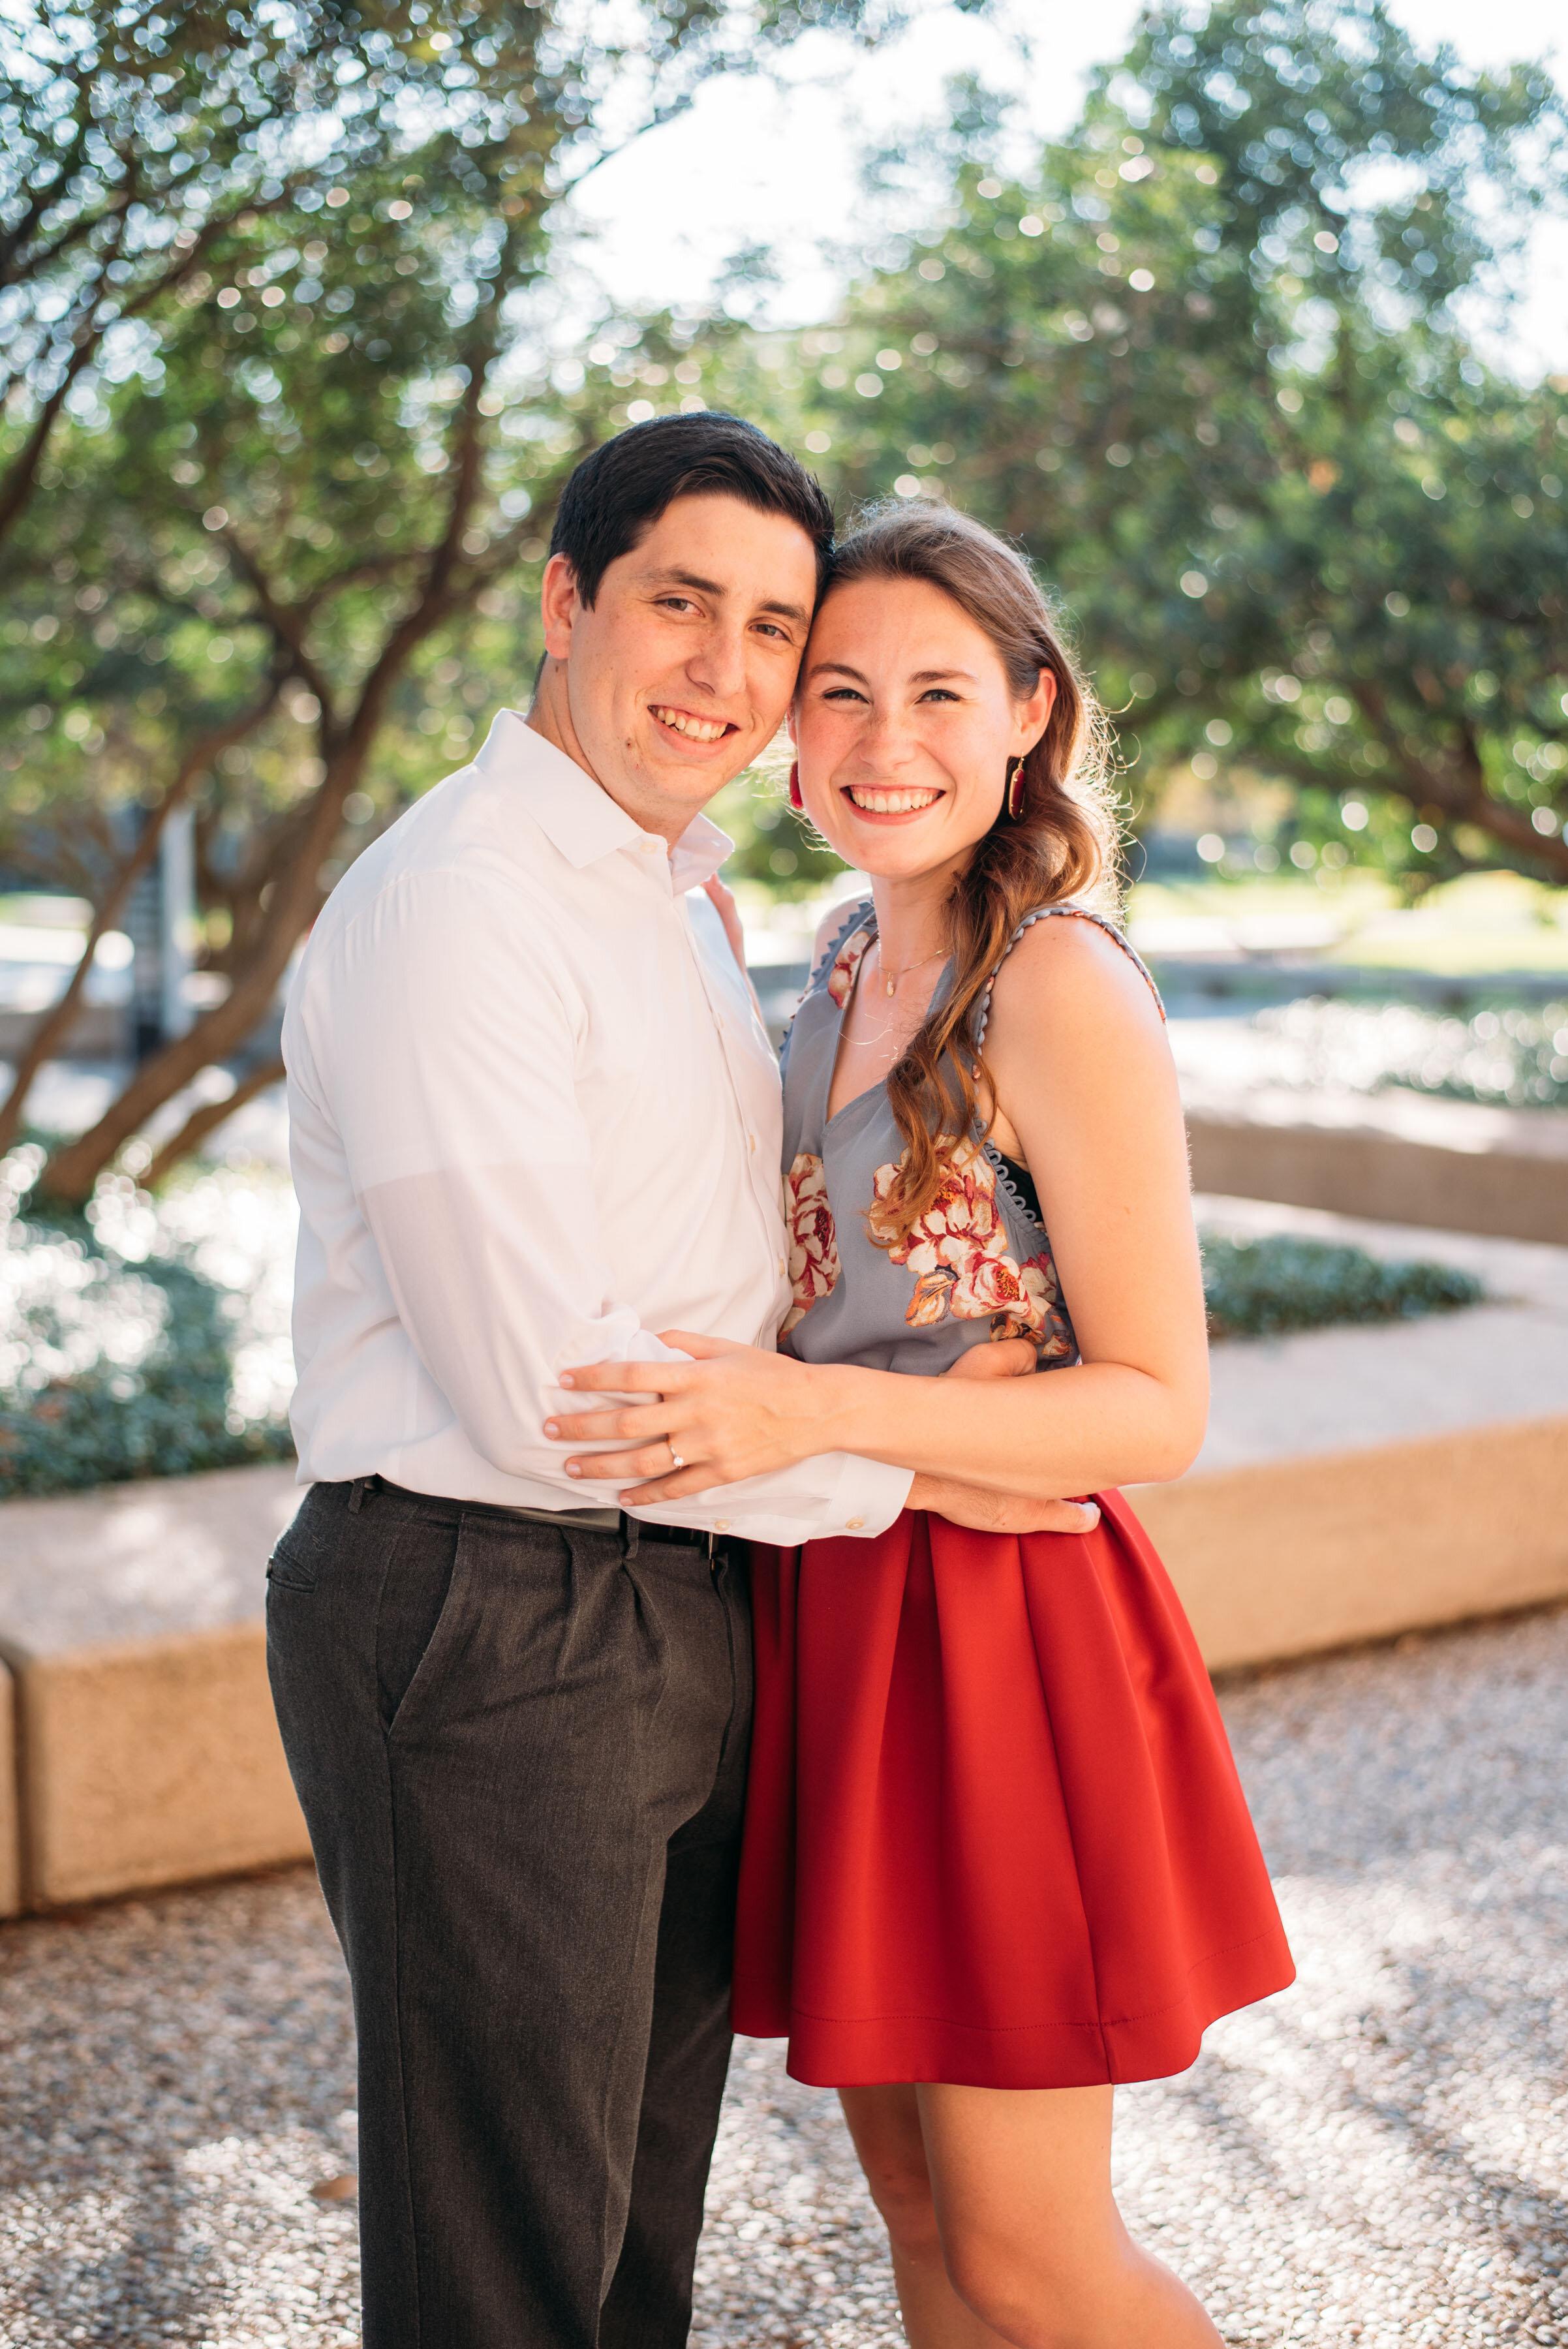 Texas-A&M-University-Engagement-Session-Century-Tree-Military-Walk-College-Station-Wedding-Photographer-San-Angel-Photo-Tony-Kate-01.jpg